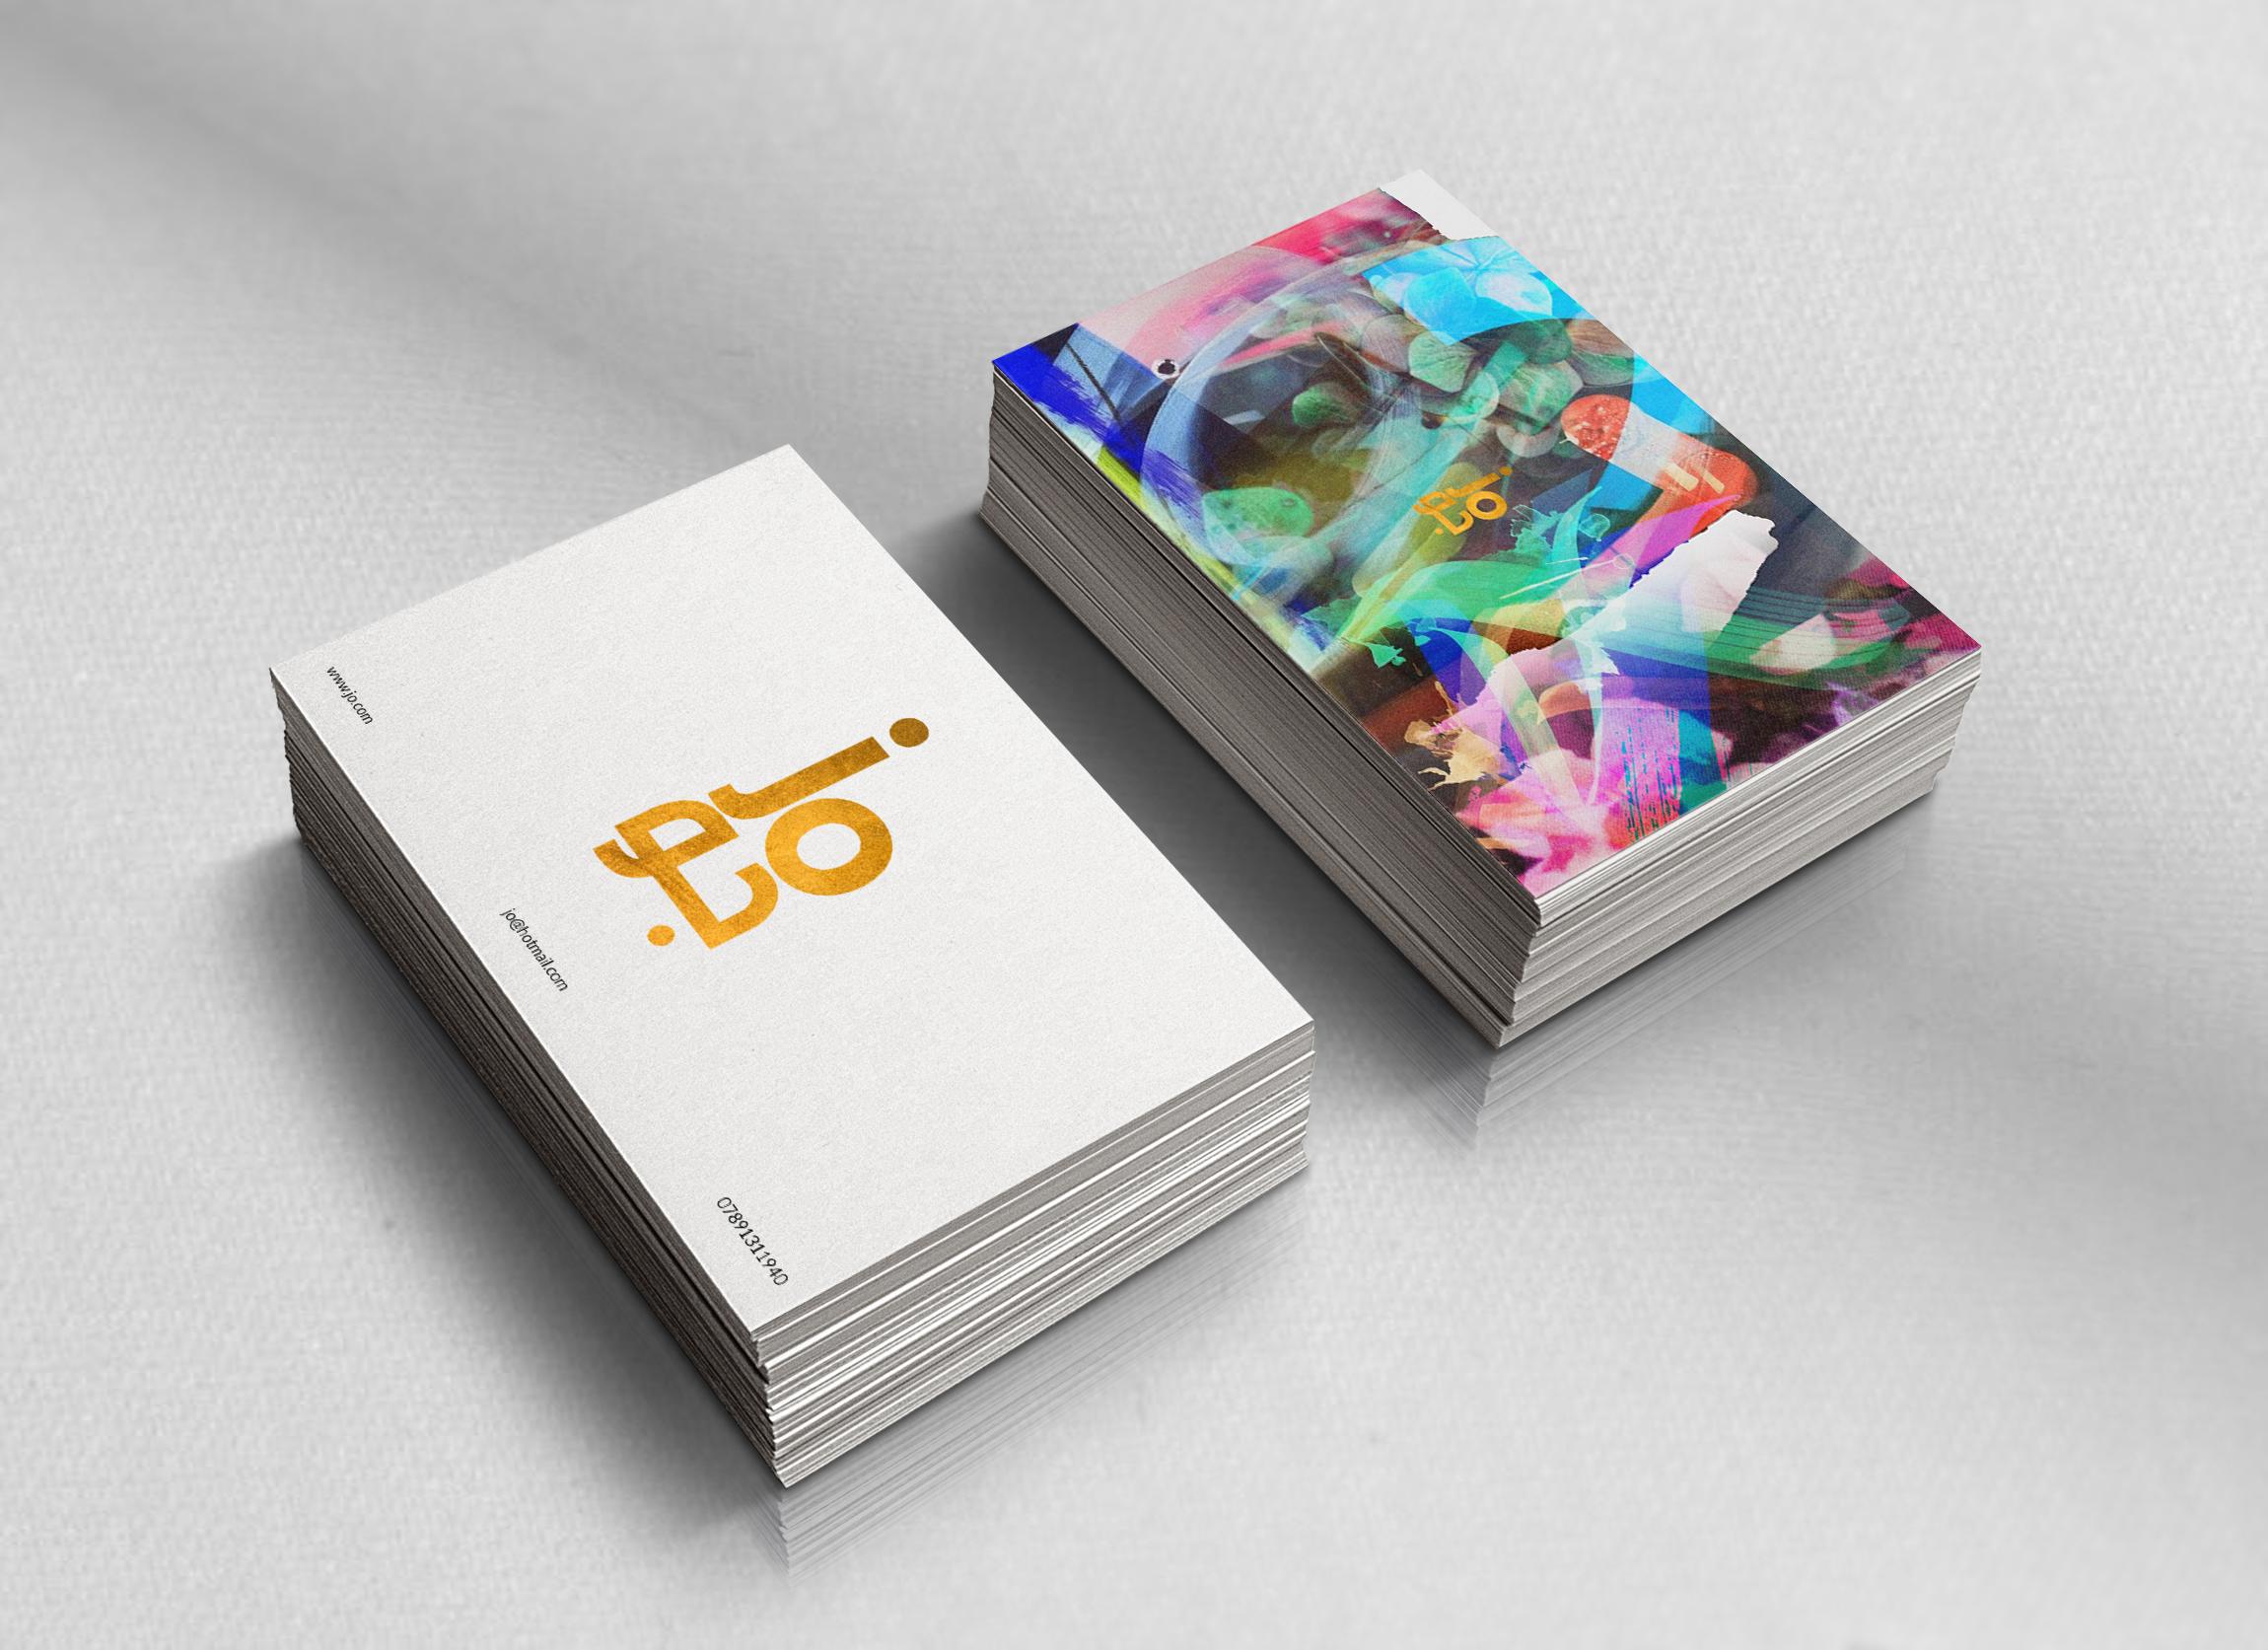 Realistic Business Card Mock-Upbg.jpg